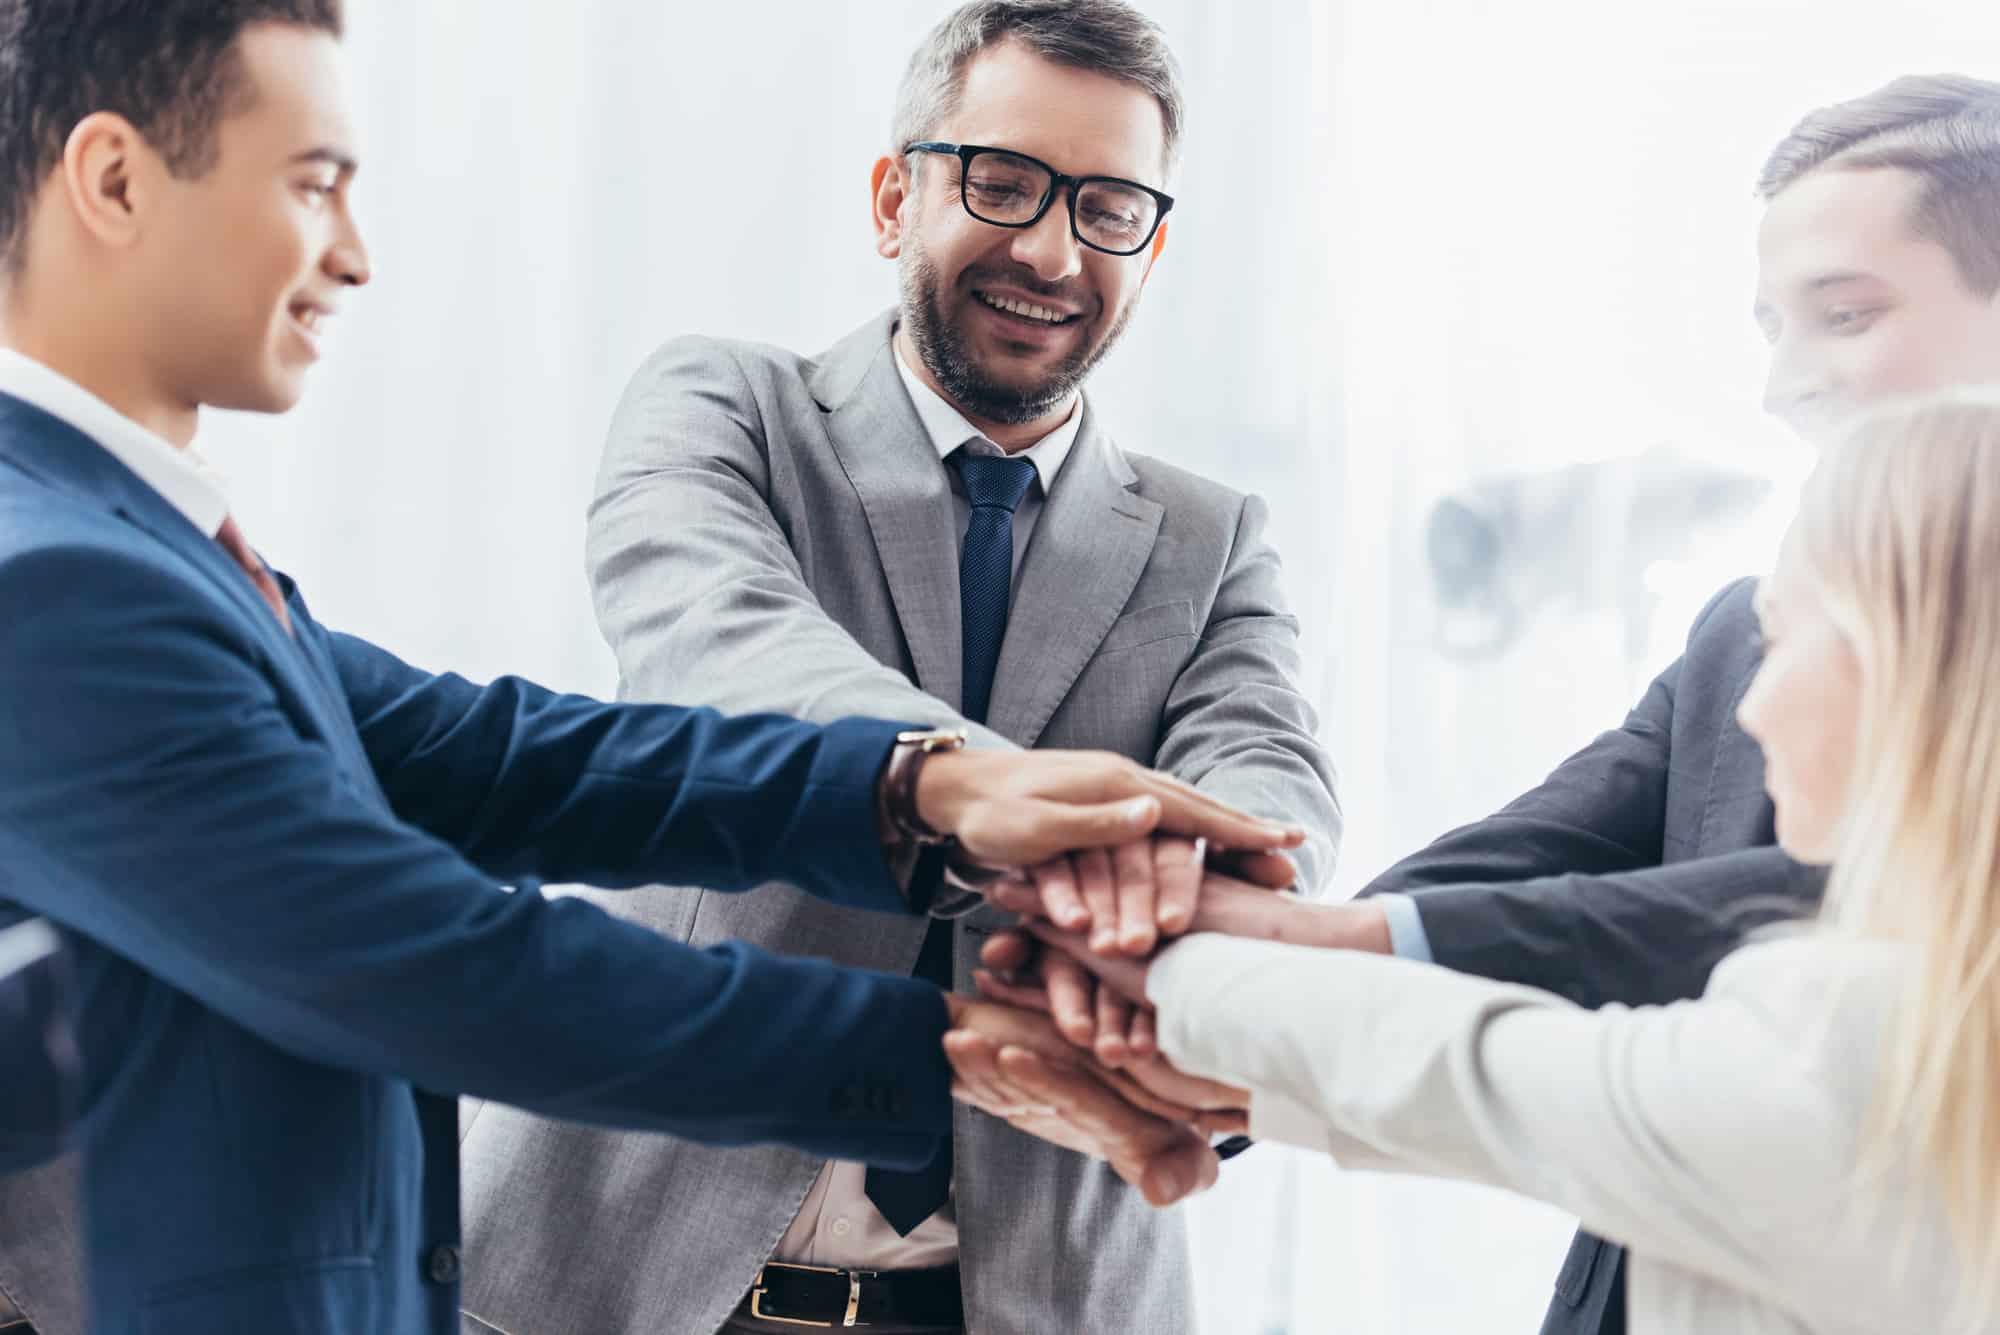 Negative leadership styles adopted under pressure